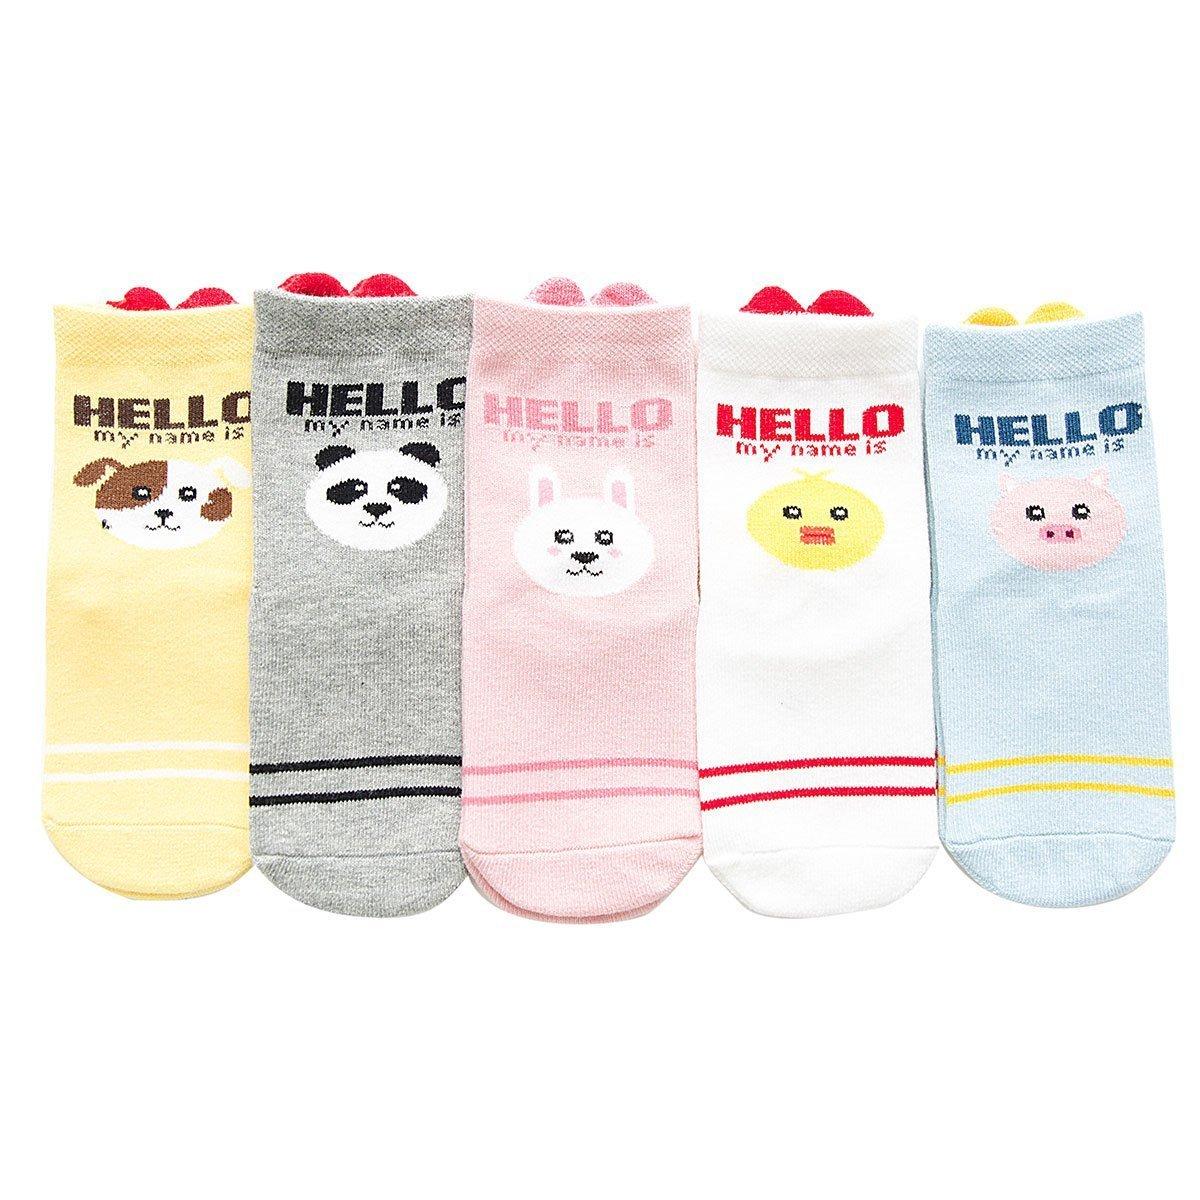 Rallytan Kids Soft Socks Cotton Cozy 5 Pair Pack Cartoon Print Socks,Shoes Size 1.5-4M Little kid-Big kid/XL/9-12 years